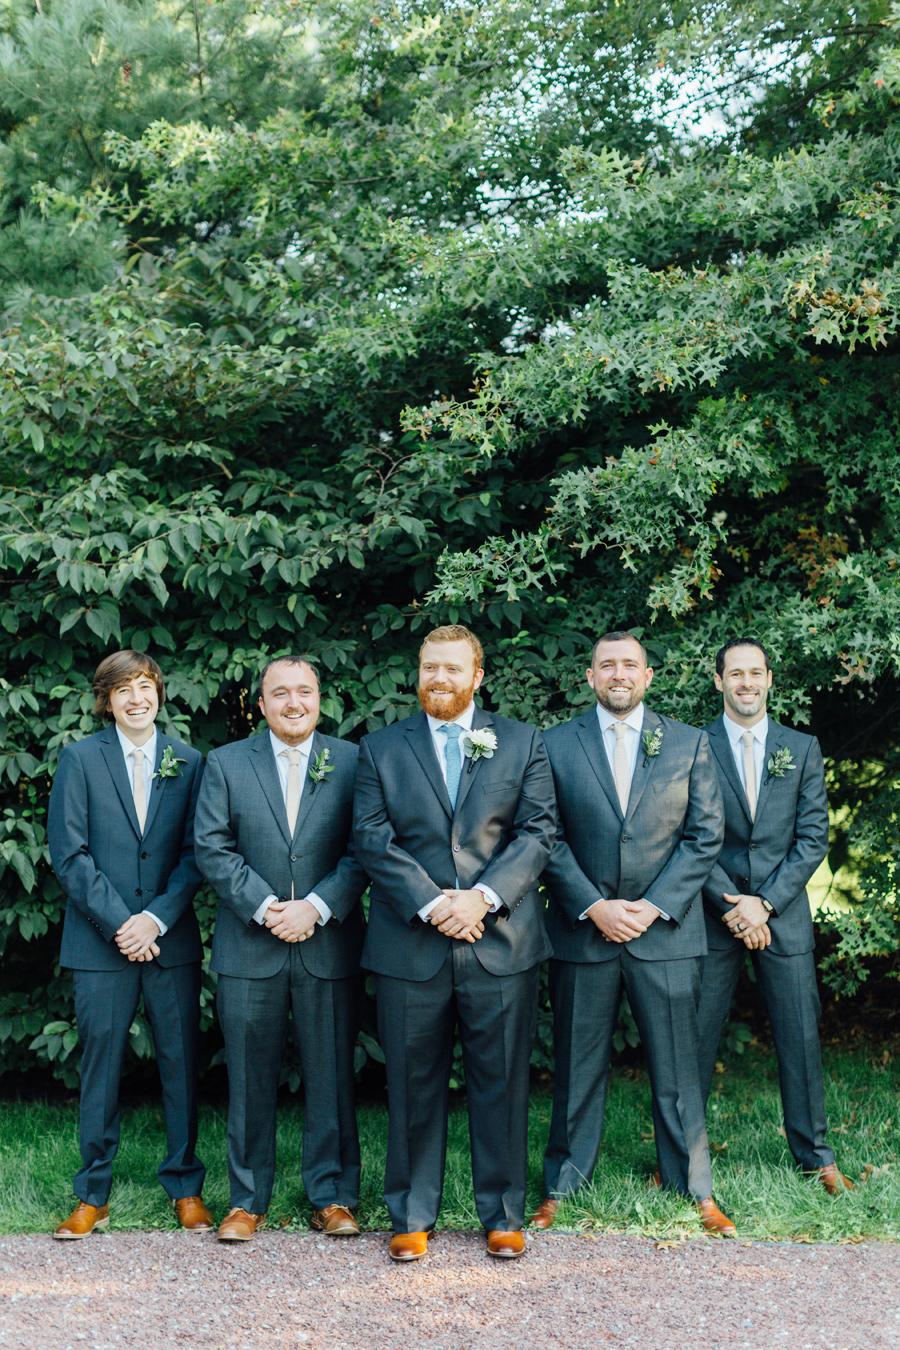 the-inn-at-leola-wedding-lancaster-pennsylvania-wedding-photographer-rebeka-viola-photograhy (42).jpg